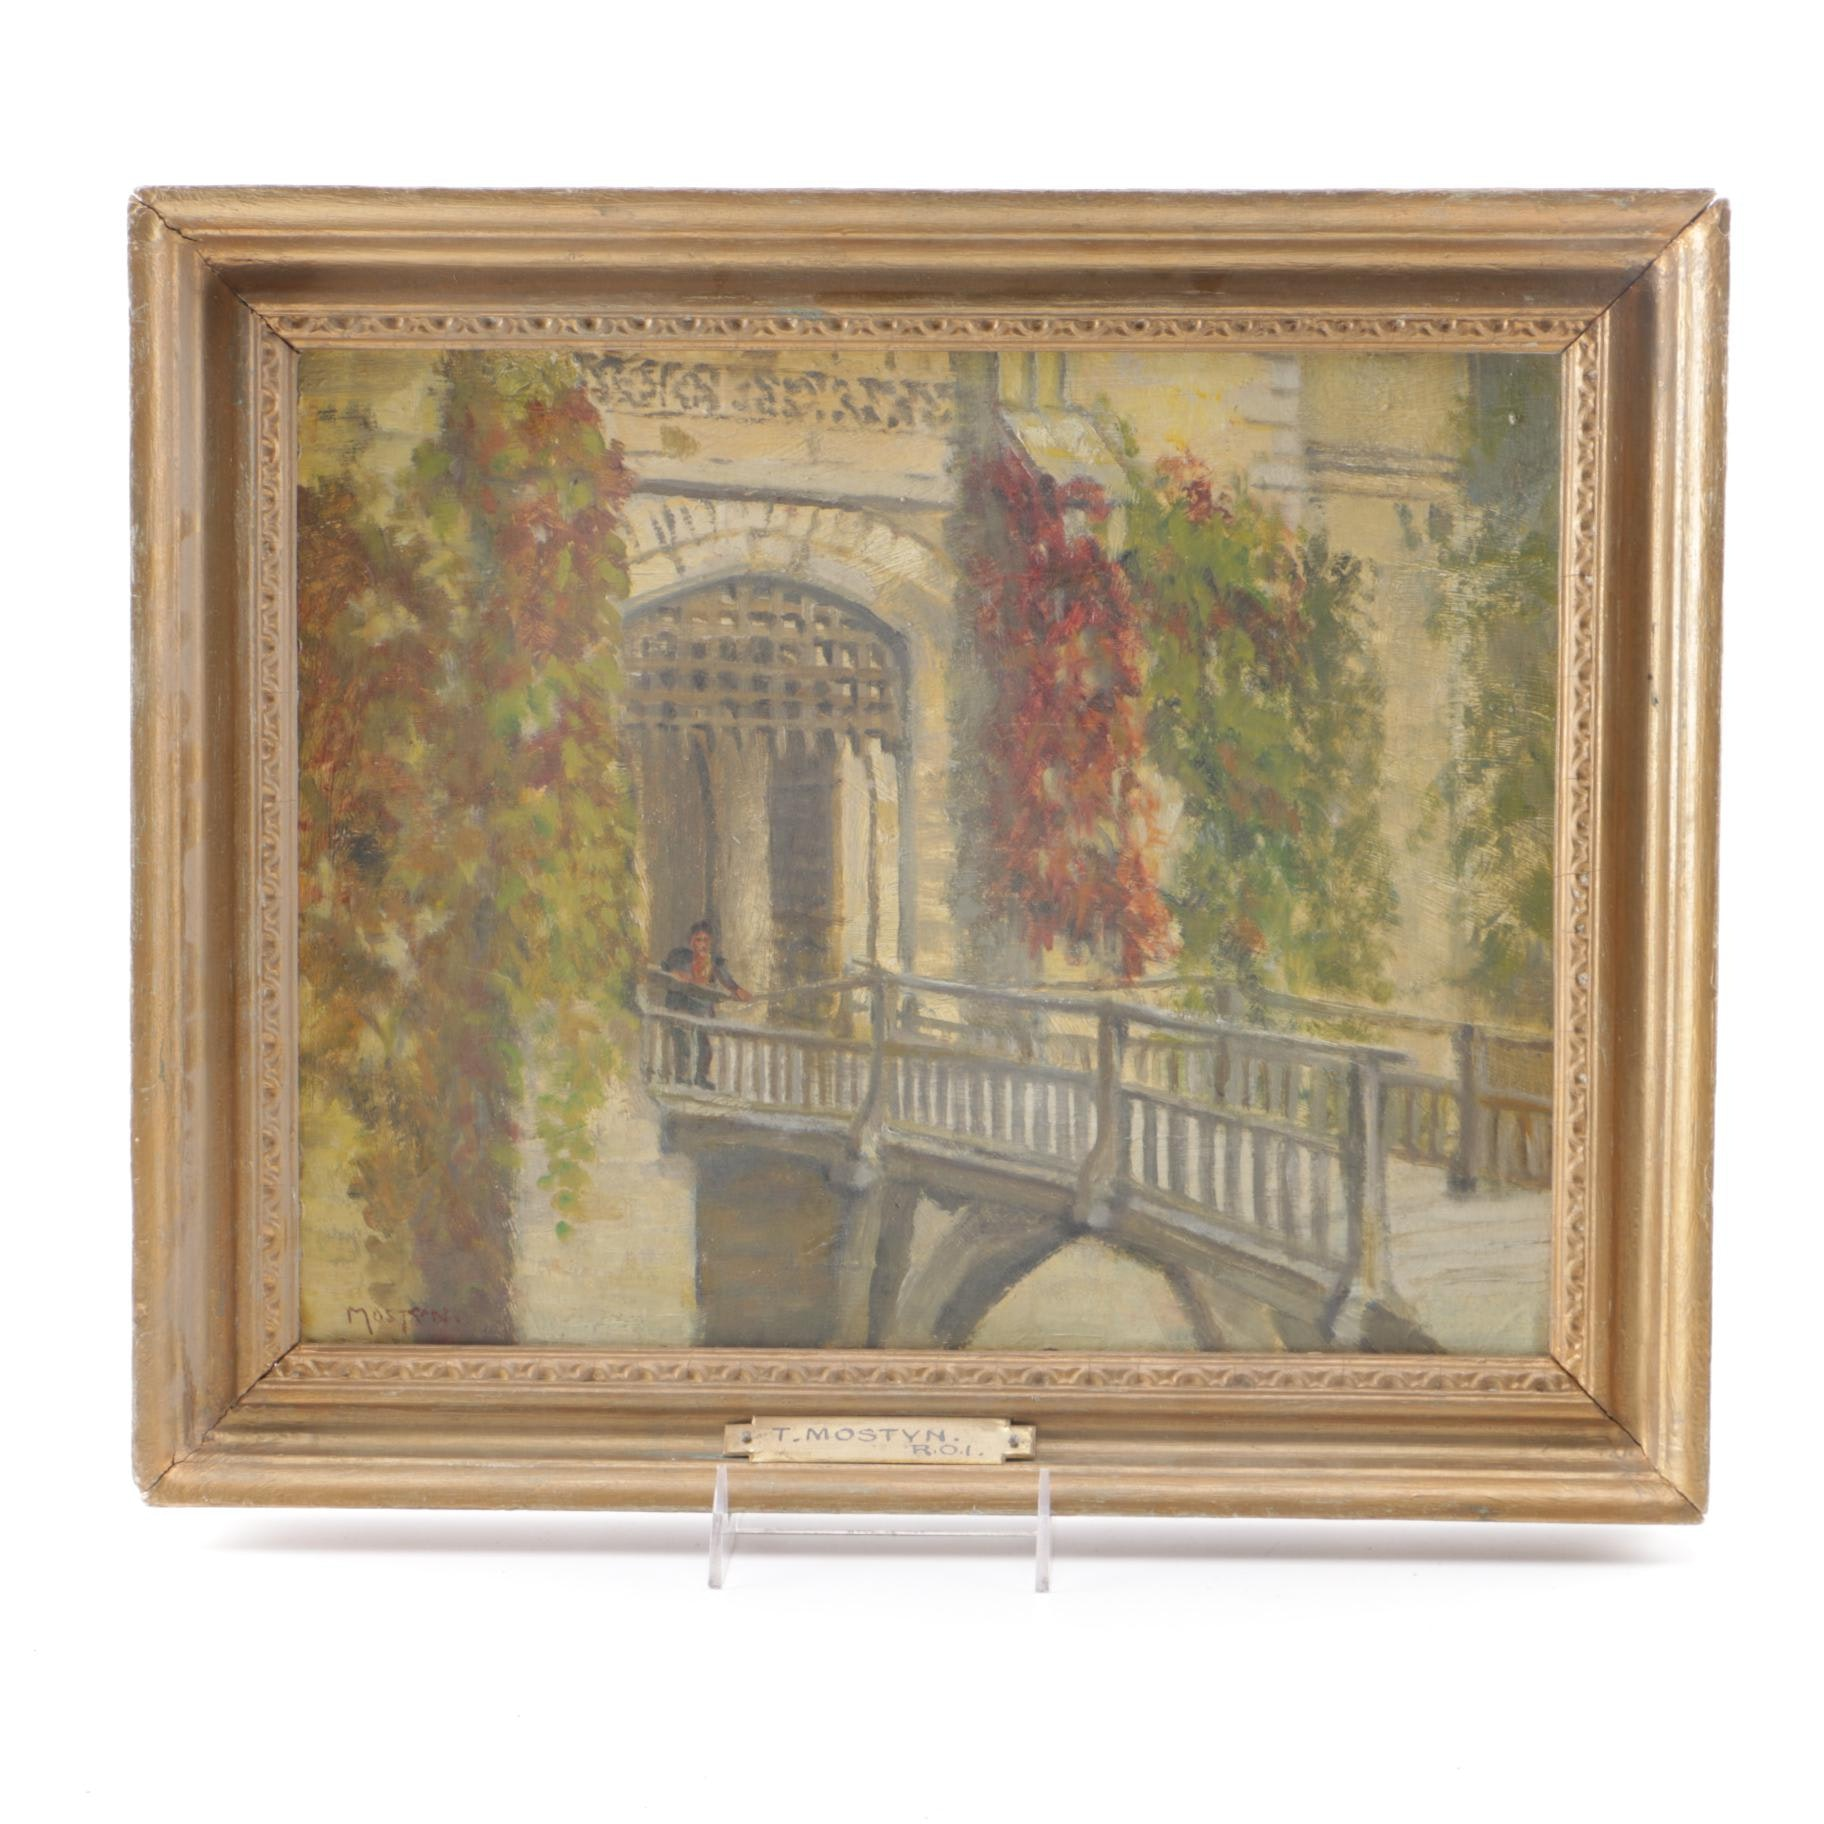 Thomas Mostyn Oil on Board Painting of Figure on Bridge